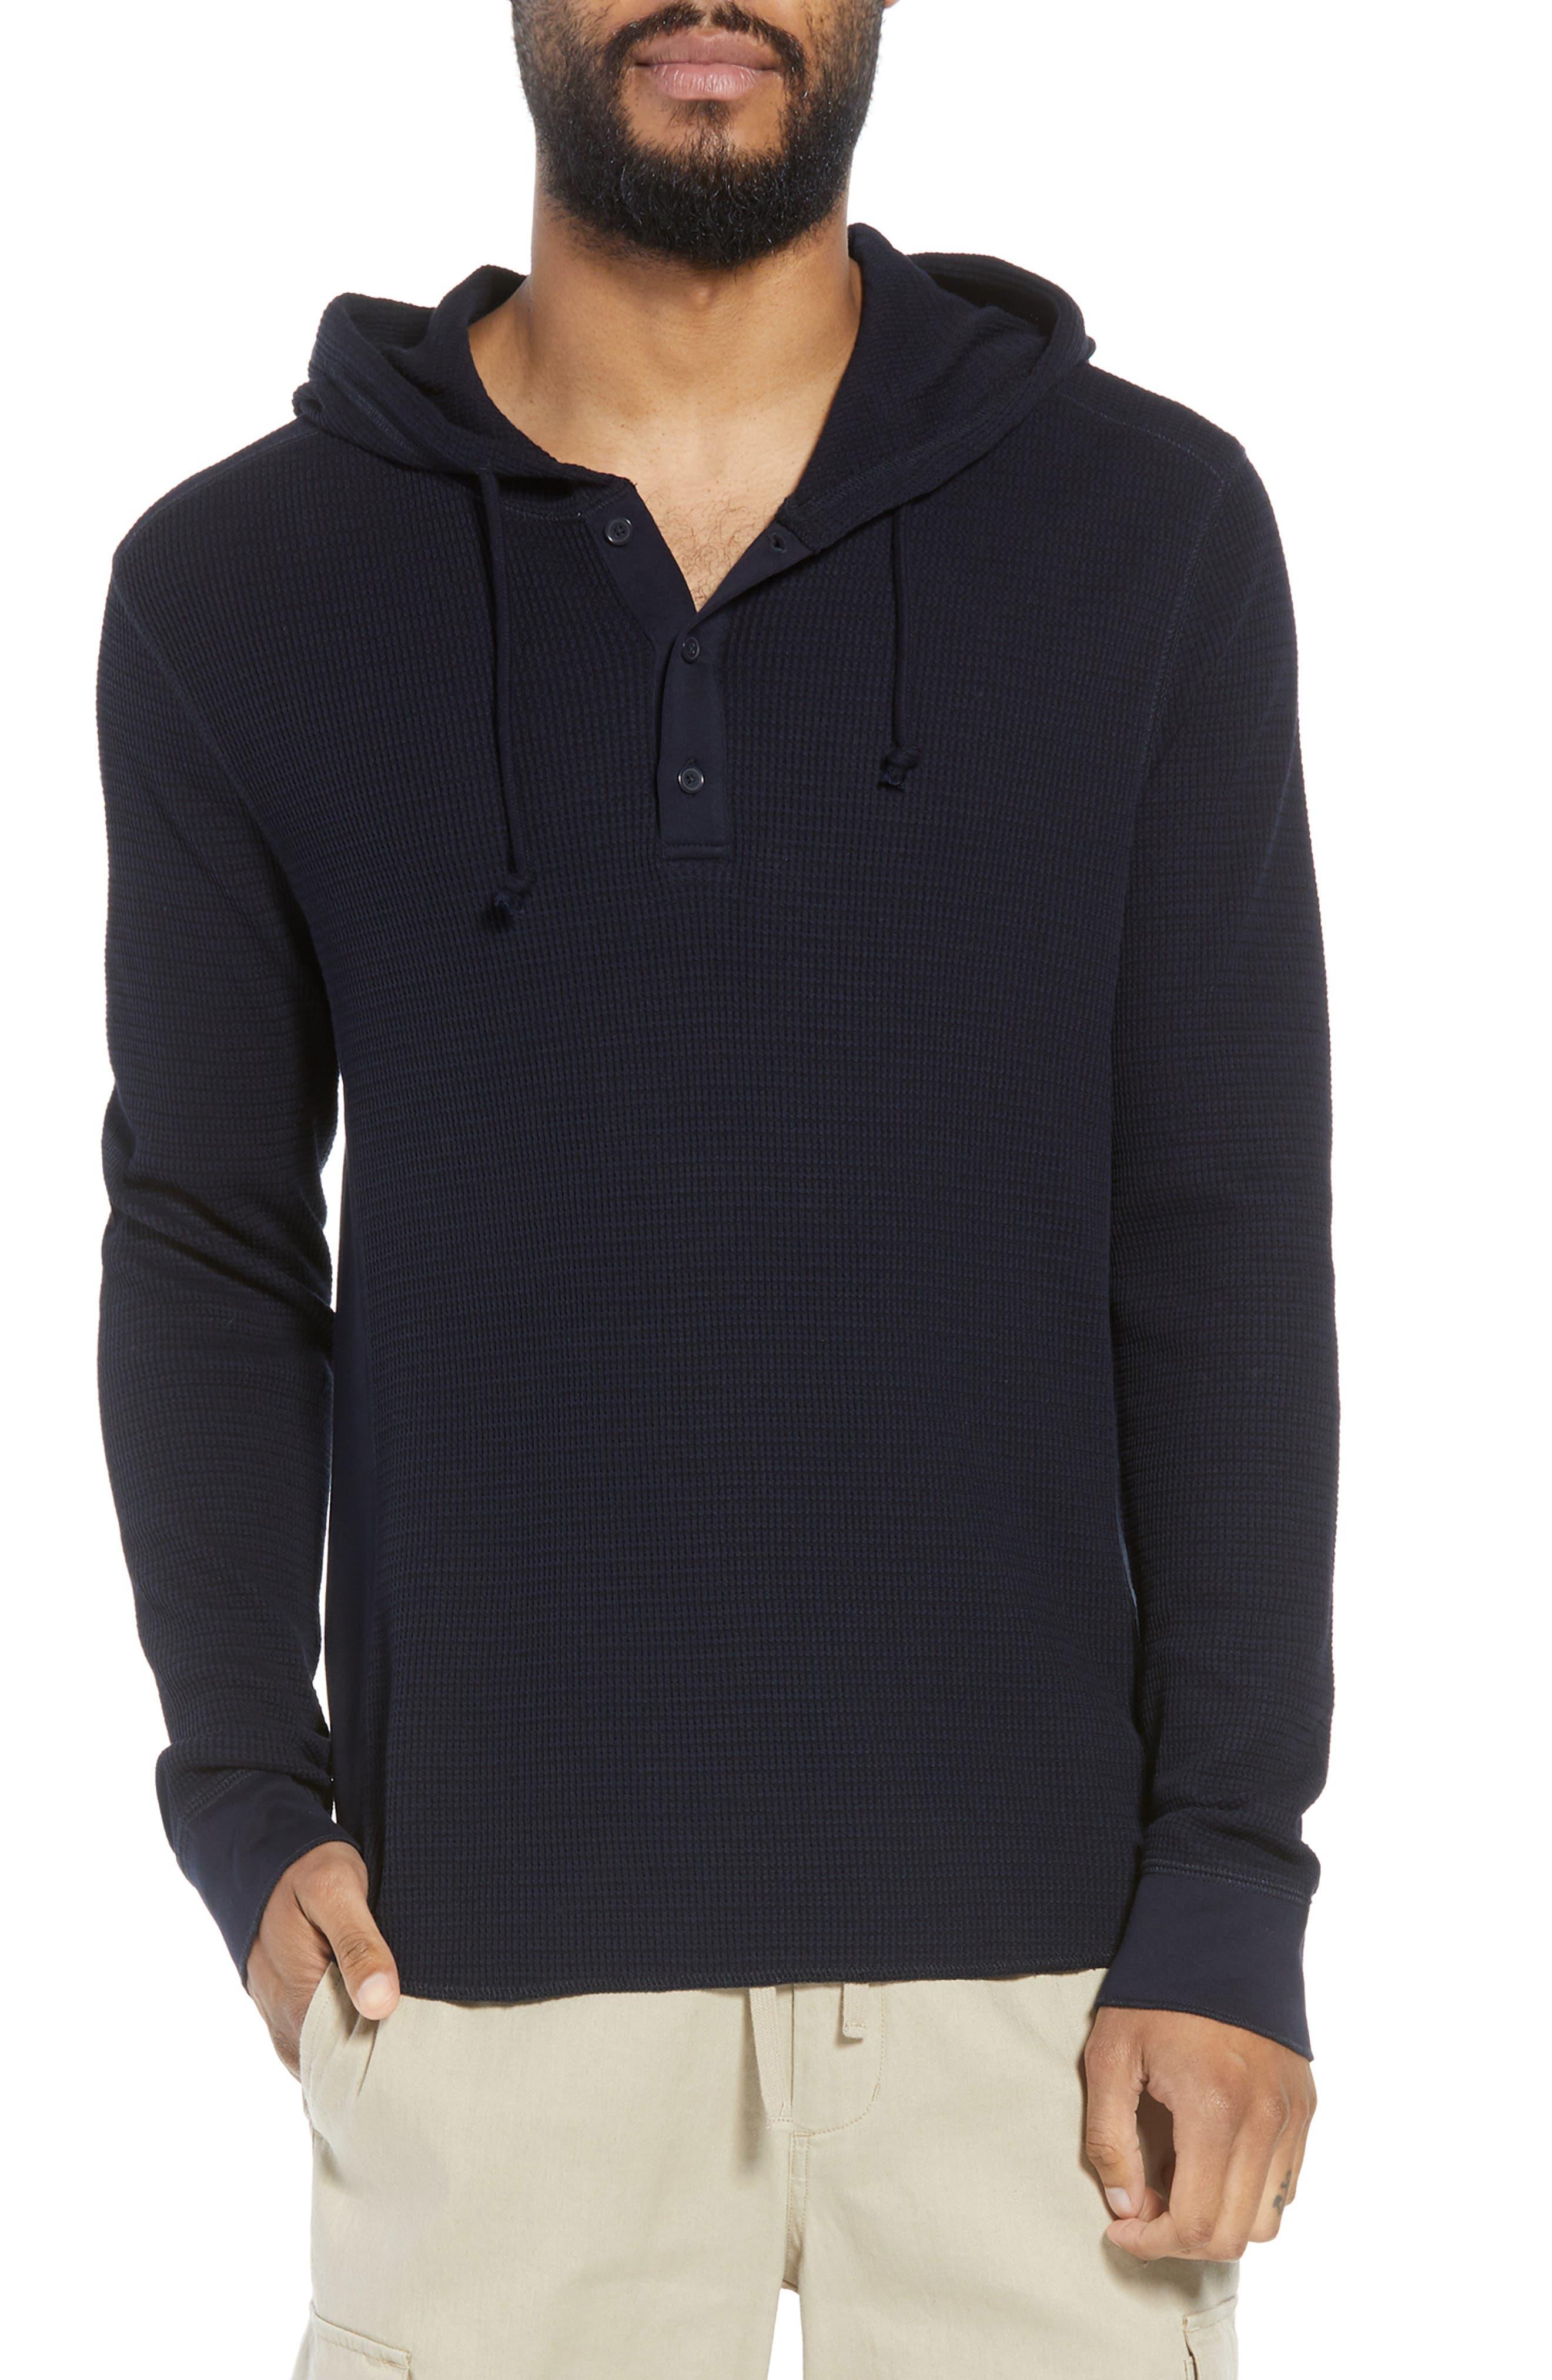 Regular Fit Thermal Knit Pullover Hoodie,                             Main thumbnail 1, color,                             New Coastal